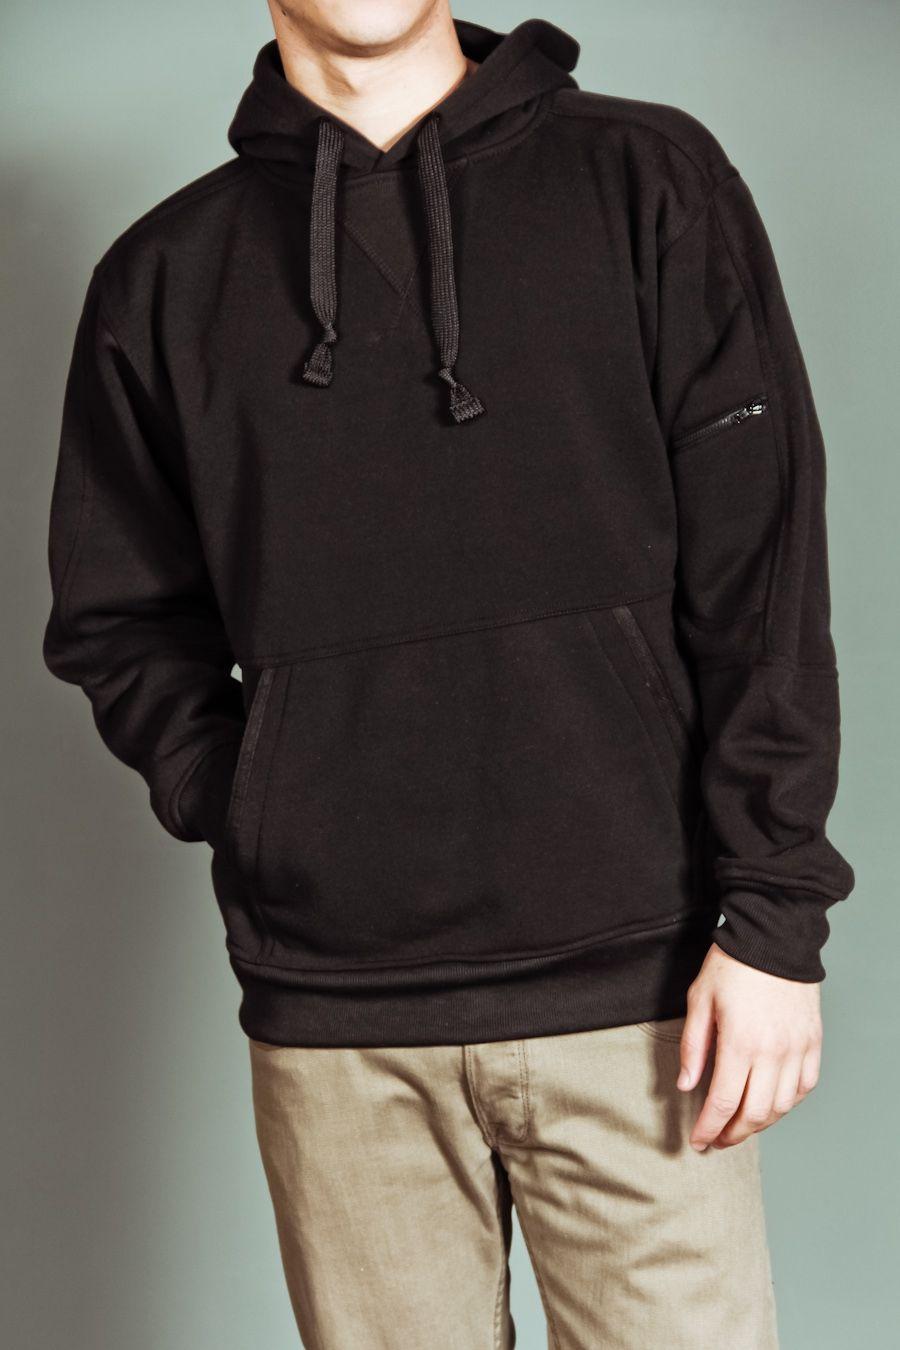 Koman Pullover Hooded Sweatshirt Black Hooded Sweatshirts Black Sweatshirts Sweatshirts [ 1350 x 900 Pixel ]